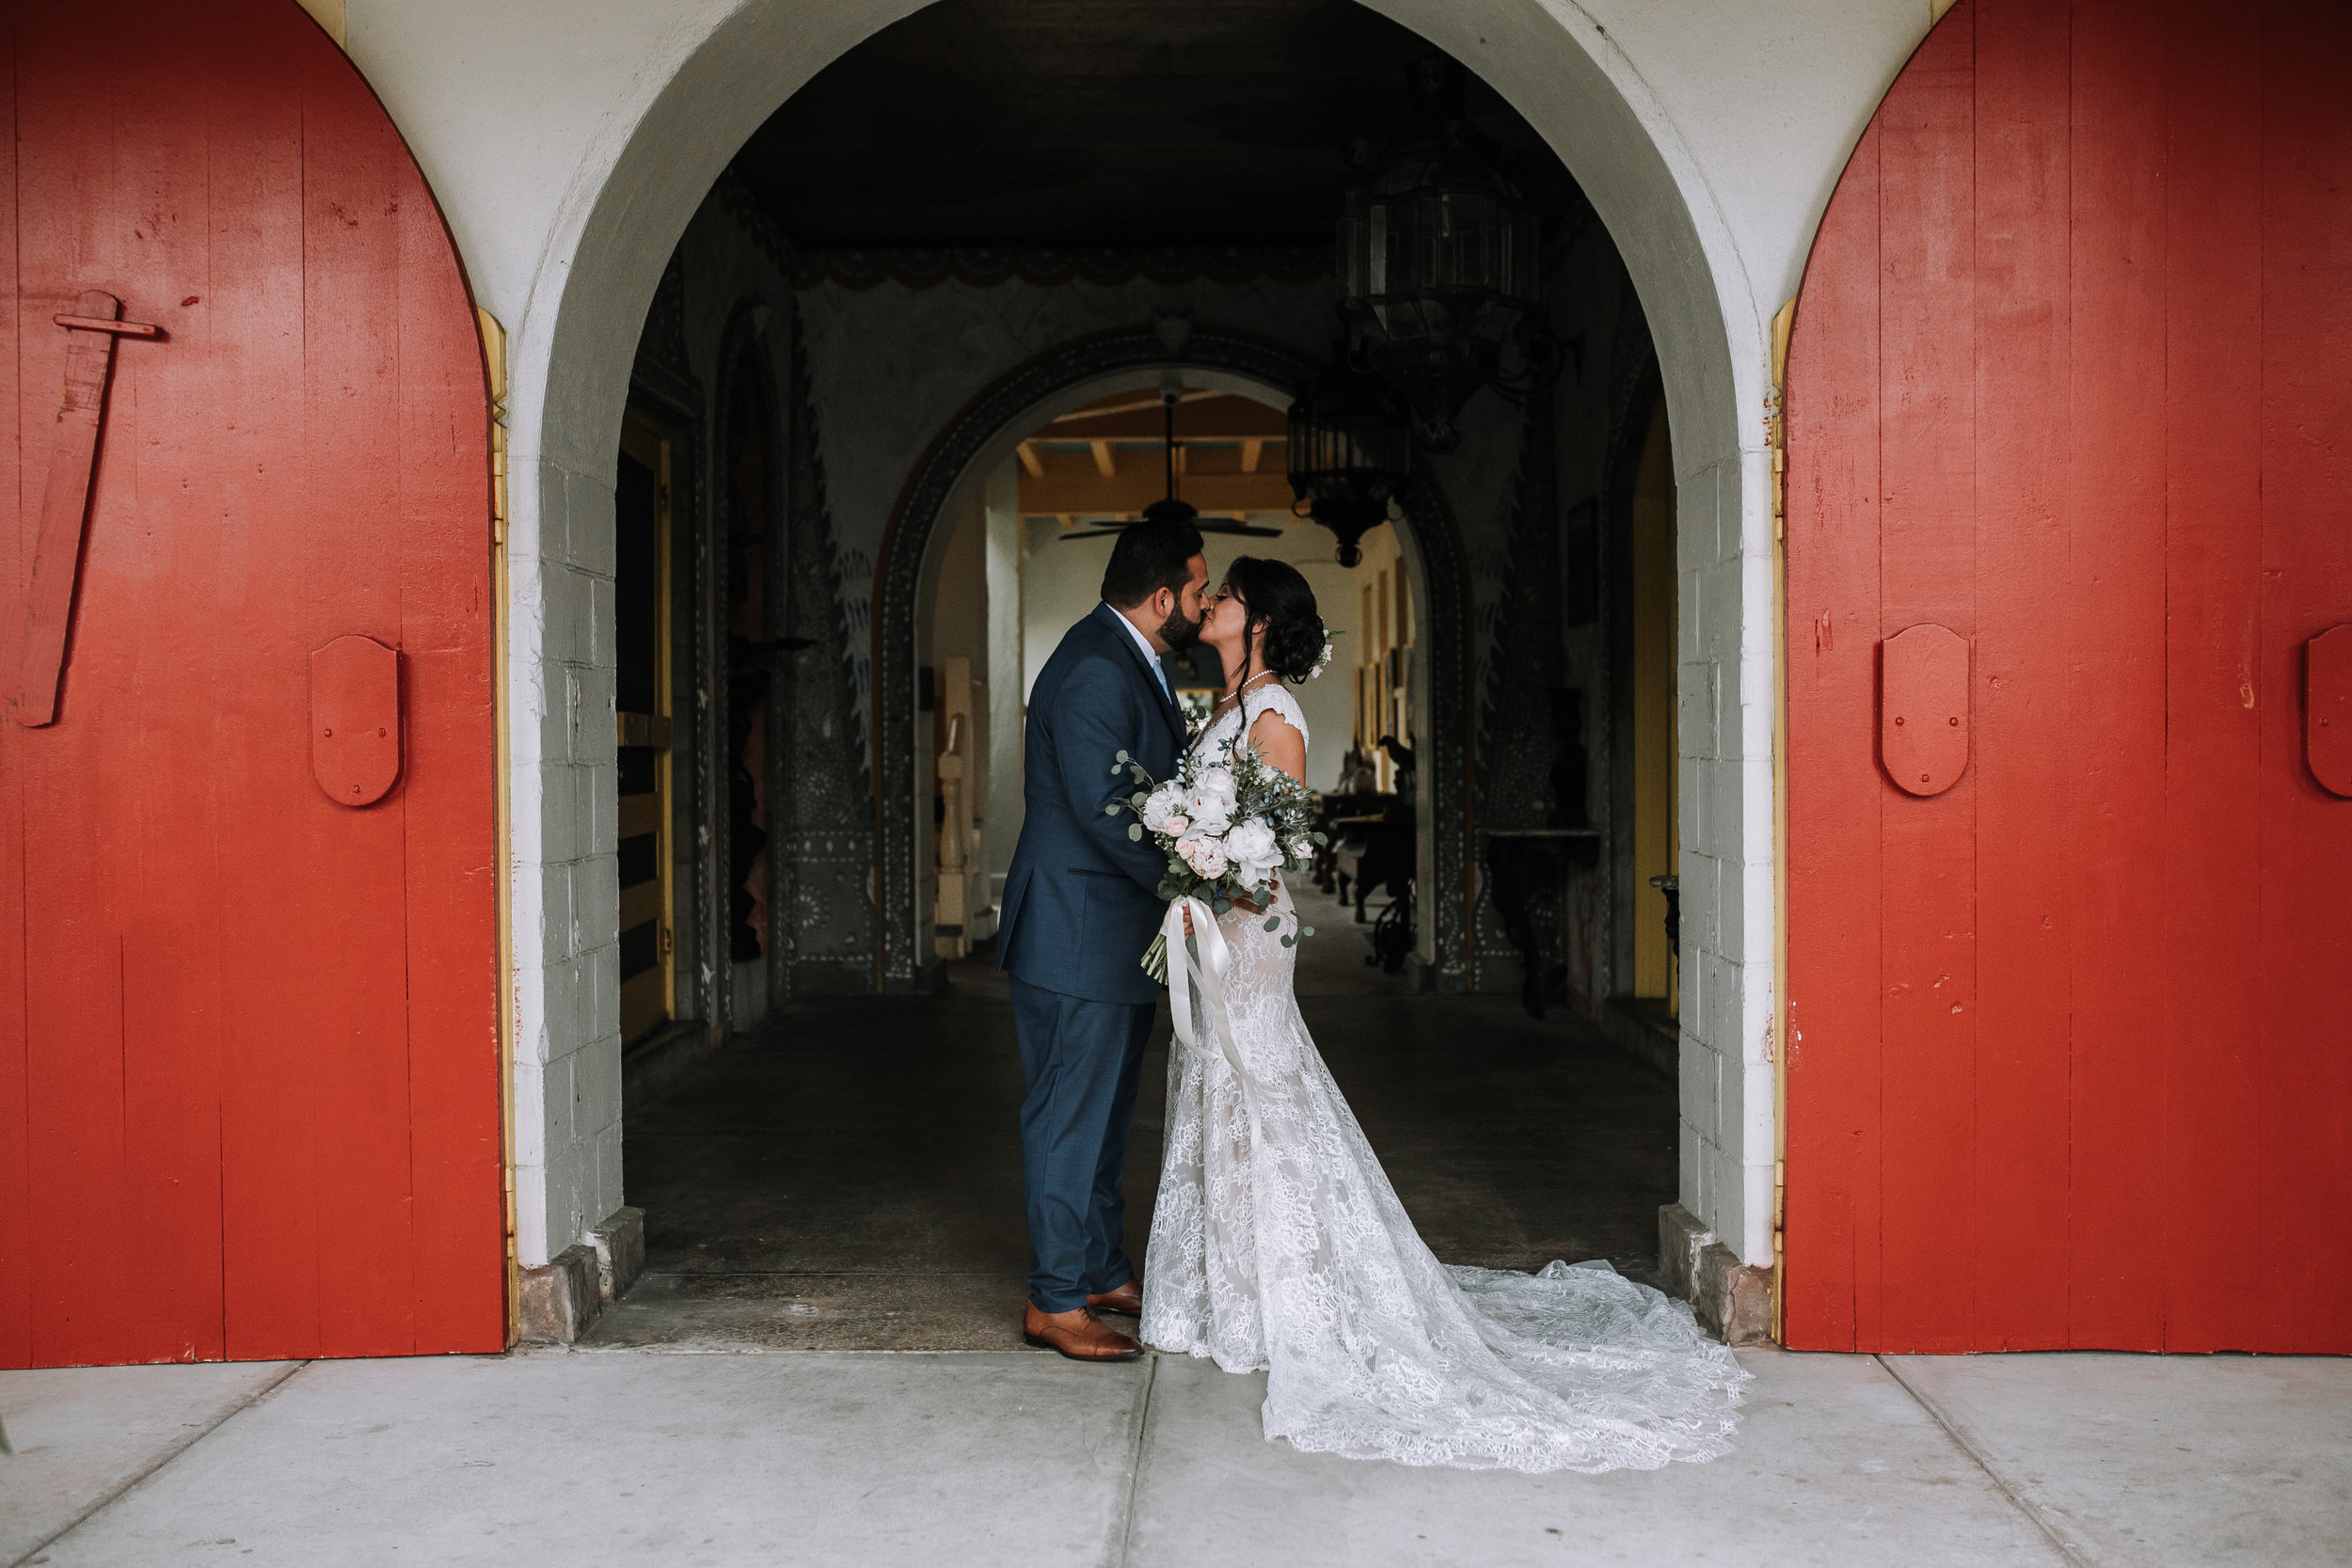 Bonett-House-wedding-fort-lauderdale-bride-and-groom-portraits